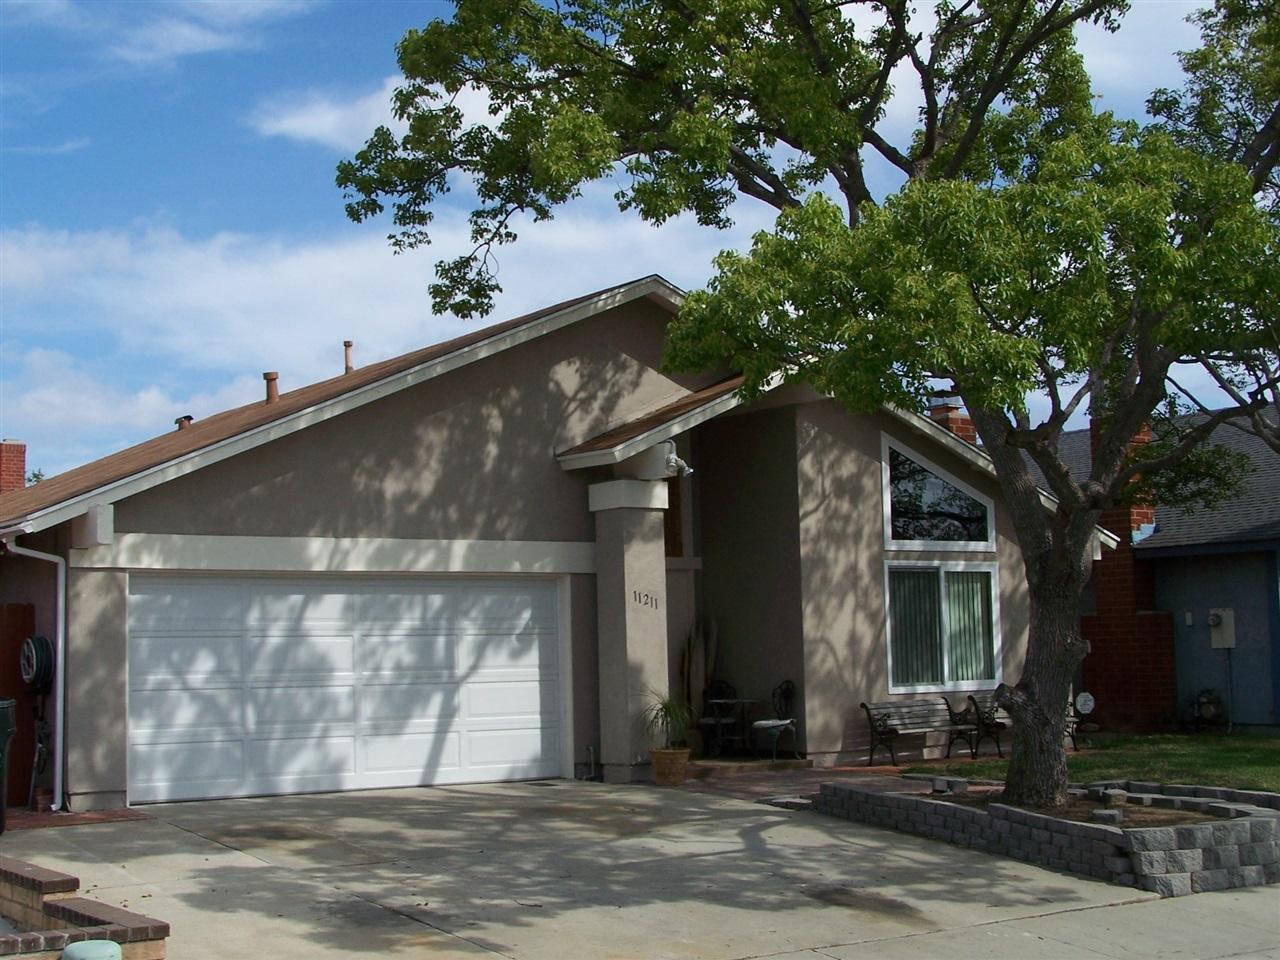 11211 Zapata Ave, San Diego, CA